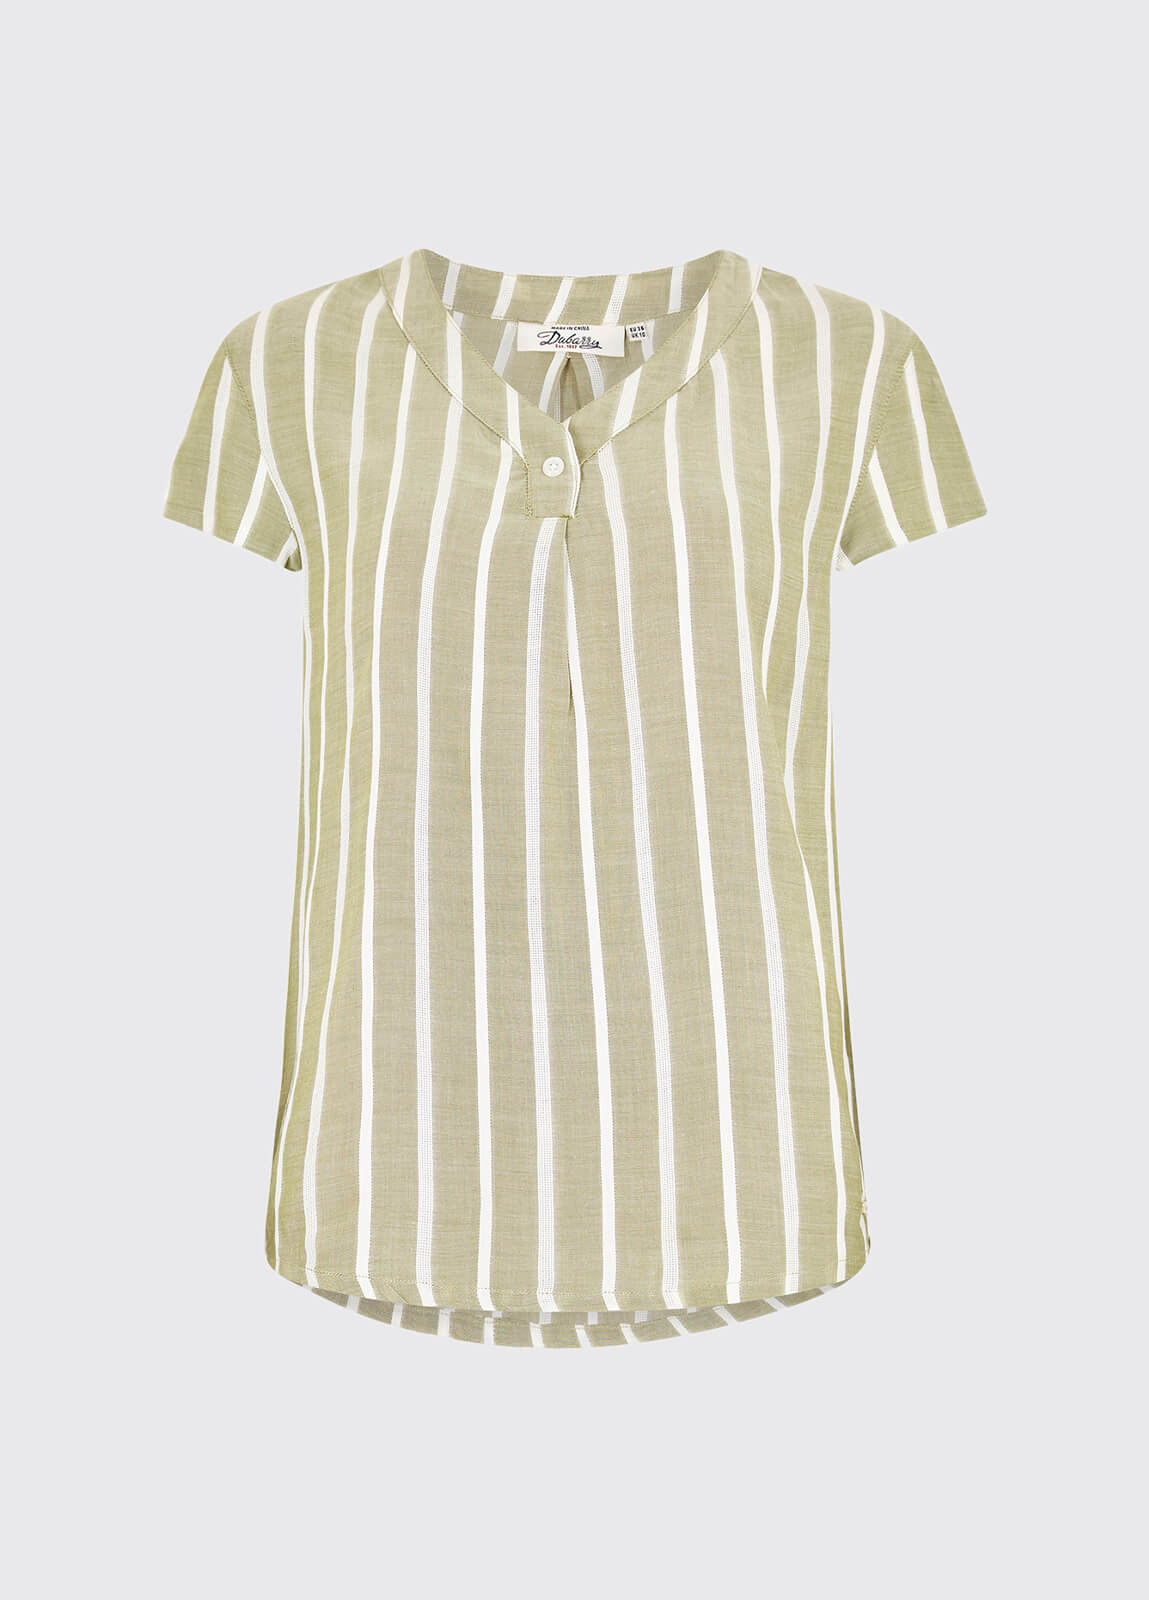 Gardenia Shirt - Khaki